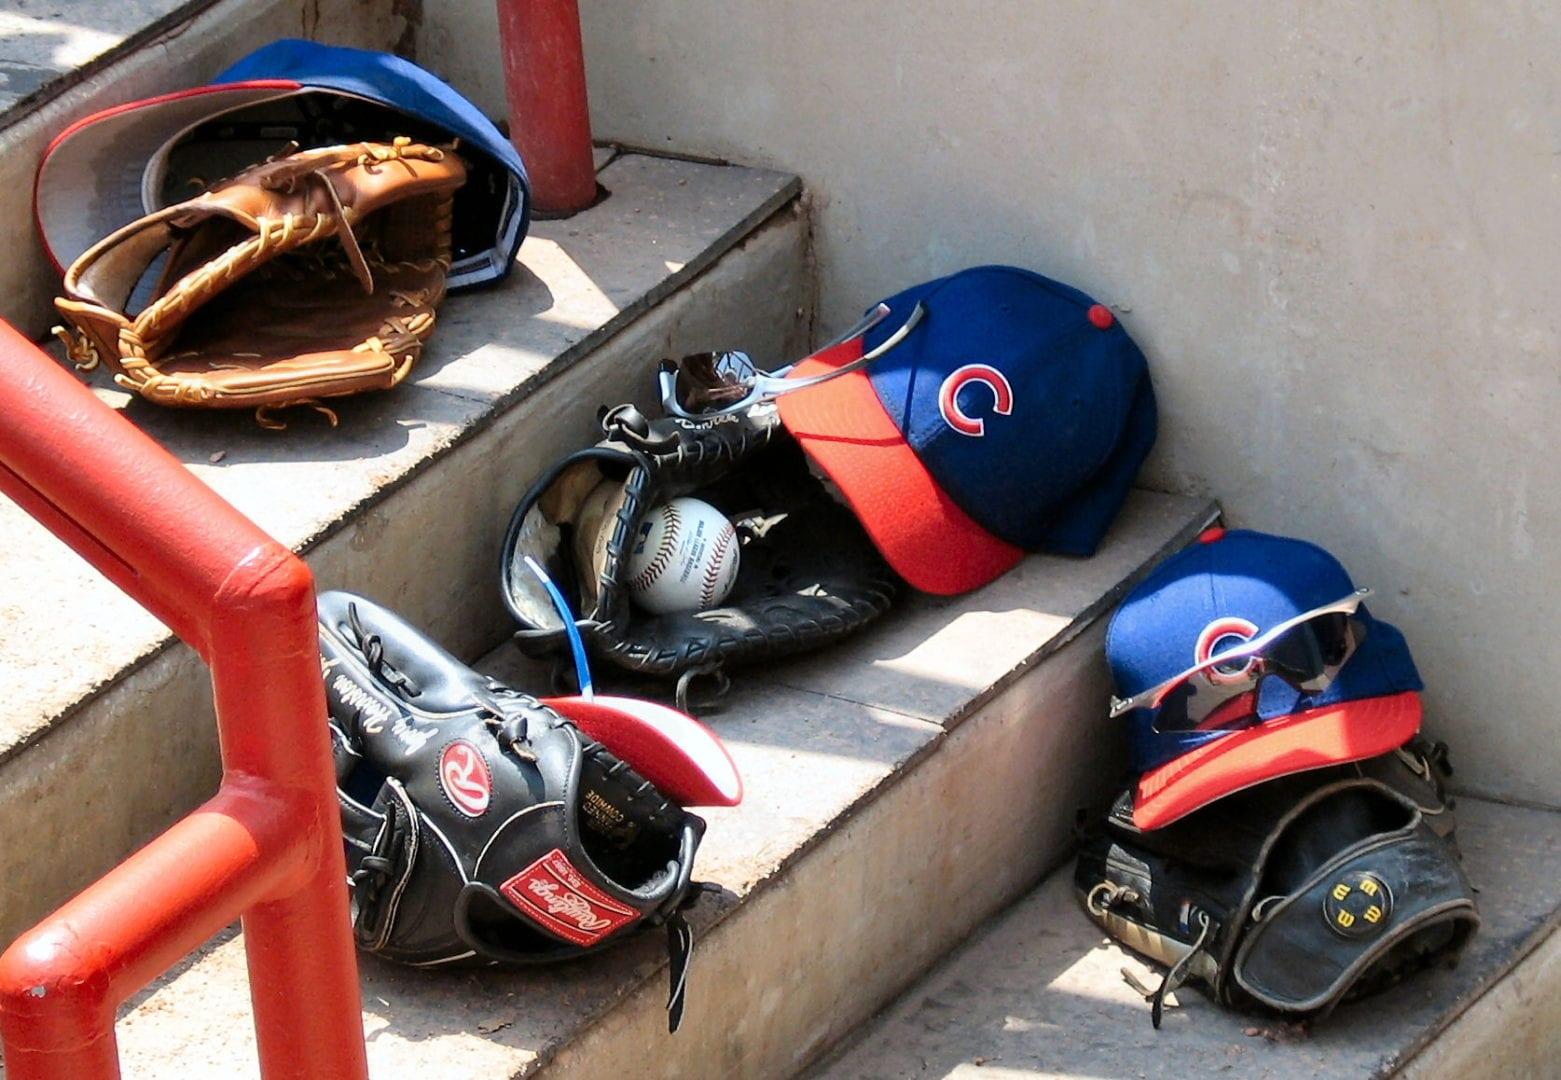 Baseball gear alon the stairs